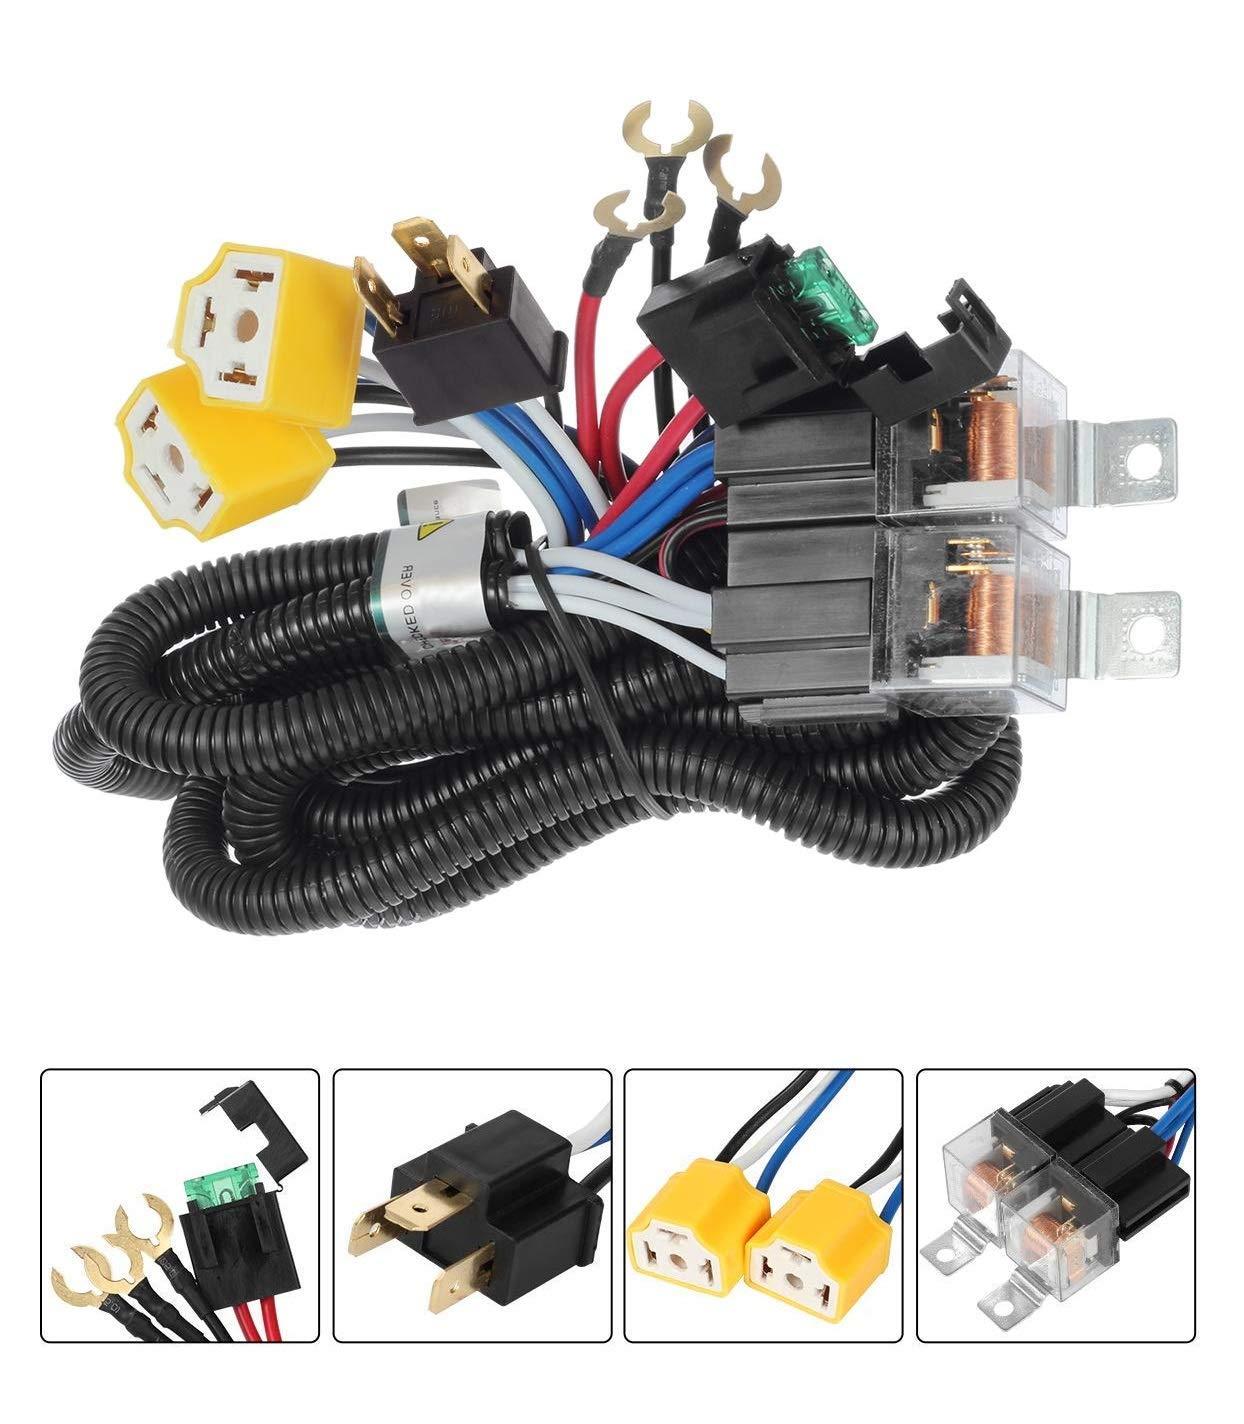 toyota pickup wiring harness partsam h4 9003 headlight relay wiring harness kit high low beam 1980 toyota pickup wiring harness partsam h4 9003 headlight relay wiring